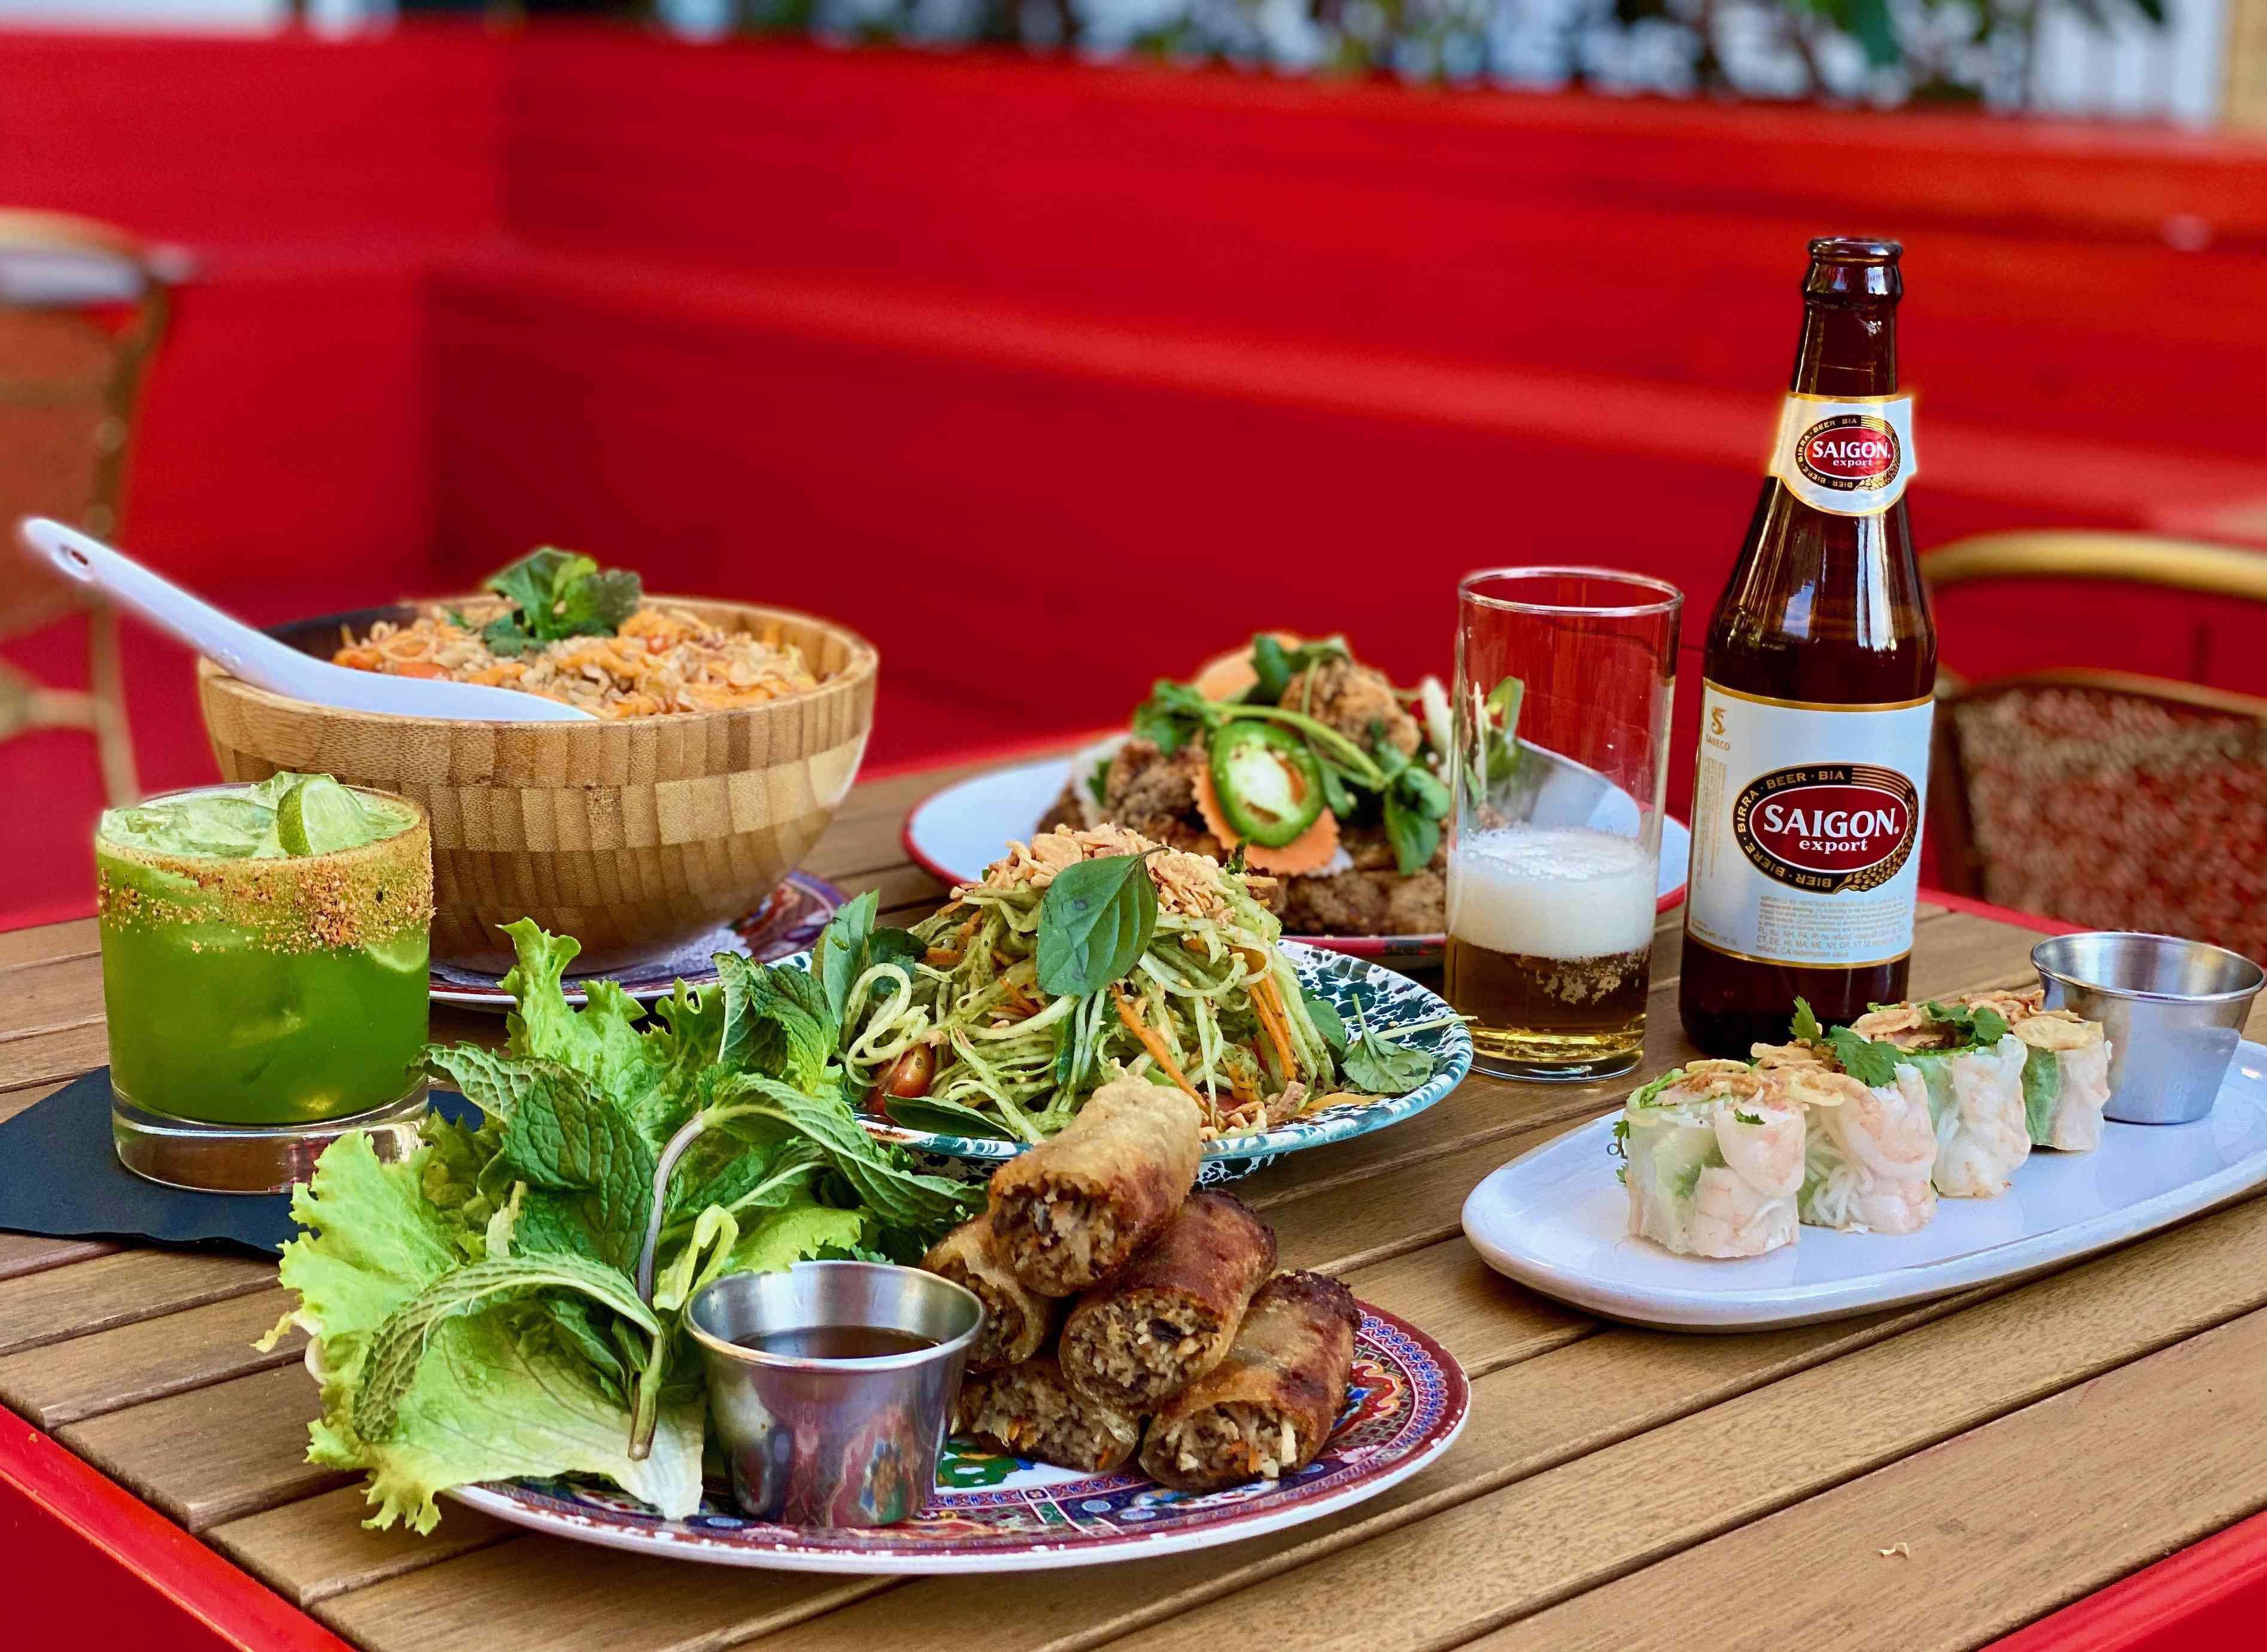 Dinner spread of Vietnamese-Cajun food including spring rolls, noodles, wraps, and Saigon beer